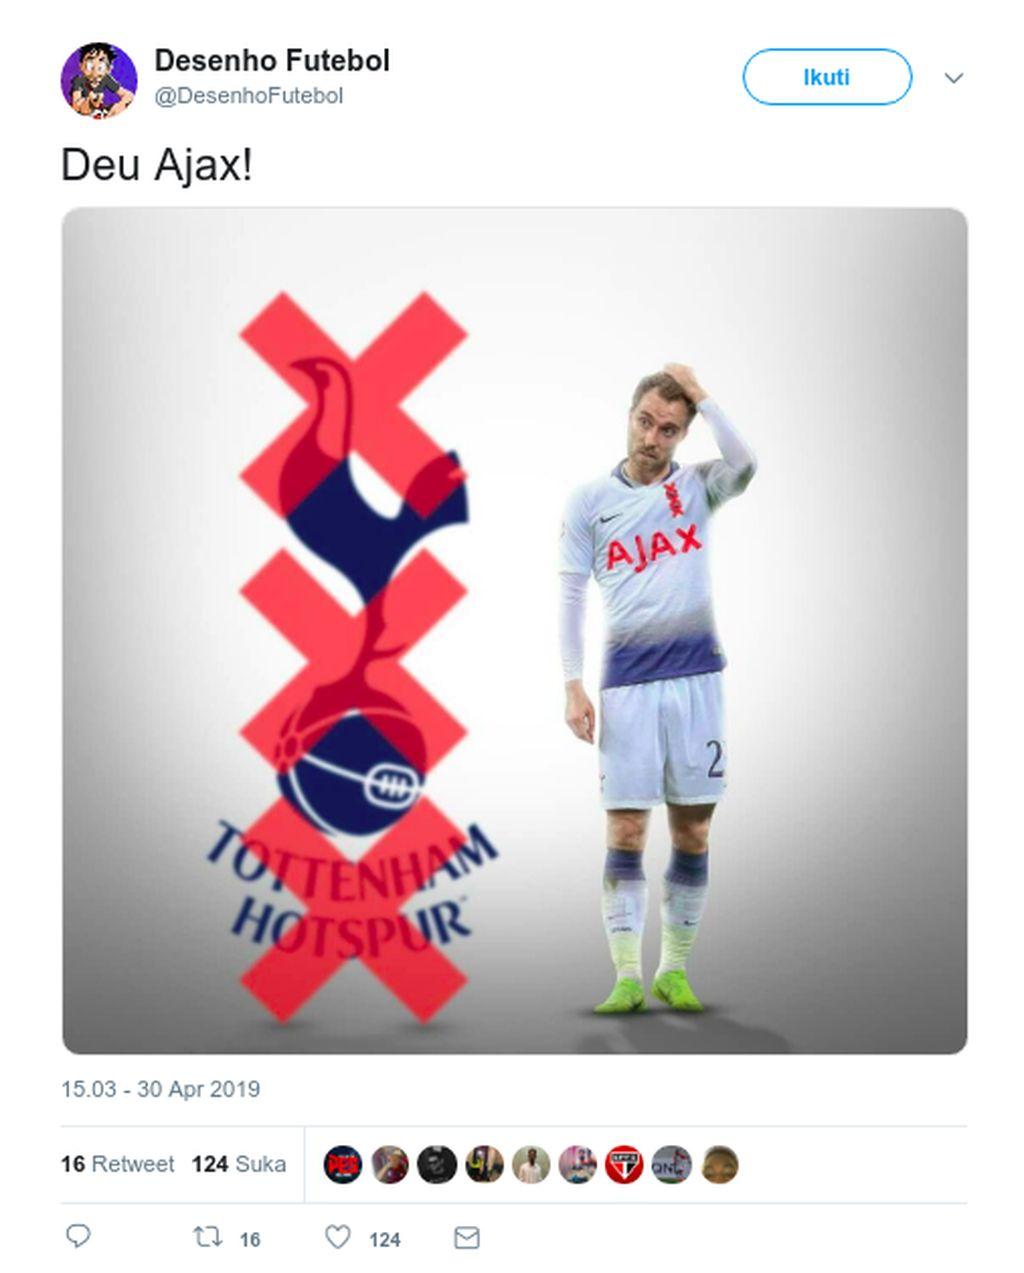 Di laga leg pertama semifinal Liga Champions, Tottenham keok di markas sendiri. Tottenham adalah korban terbaru Ajax, di mana sebelumnya Real Madrid dan Juventus merasakan keperkasaan mereka di fase knock out. Foto: Istimewa